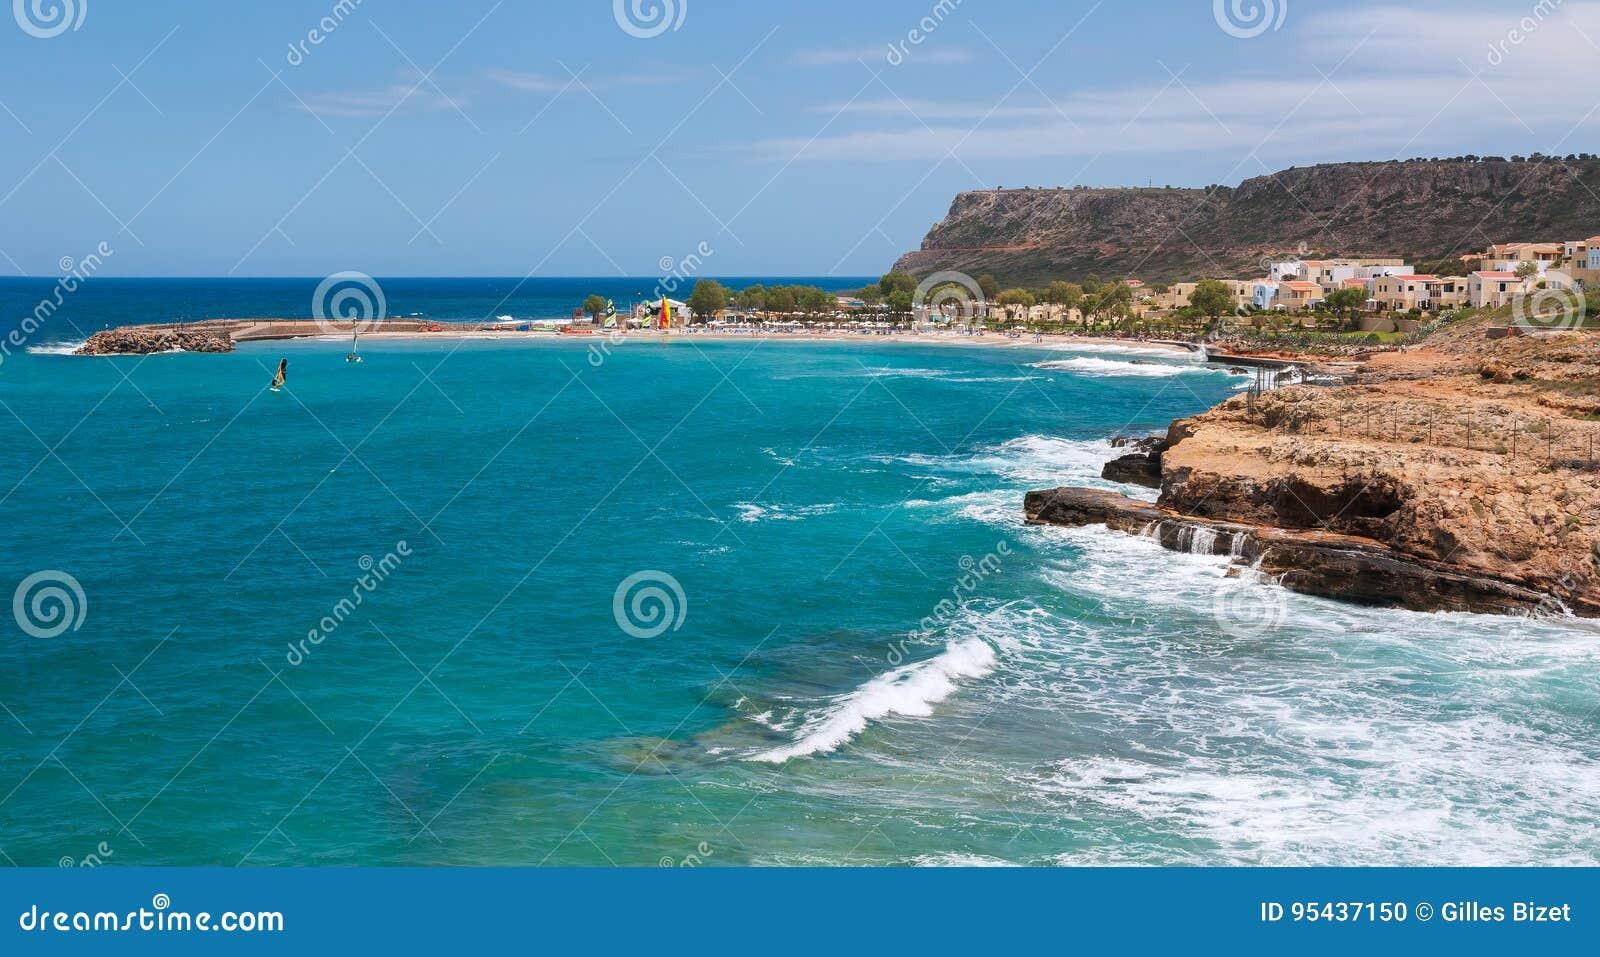 Пляж и море в Крите